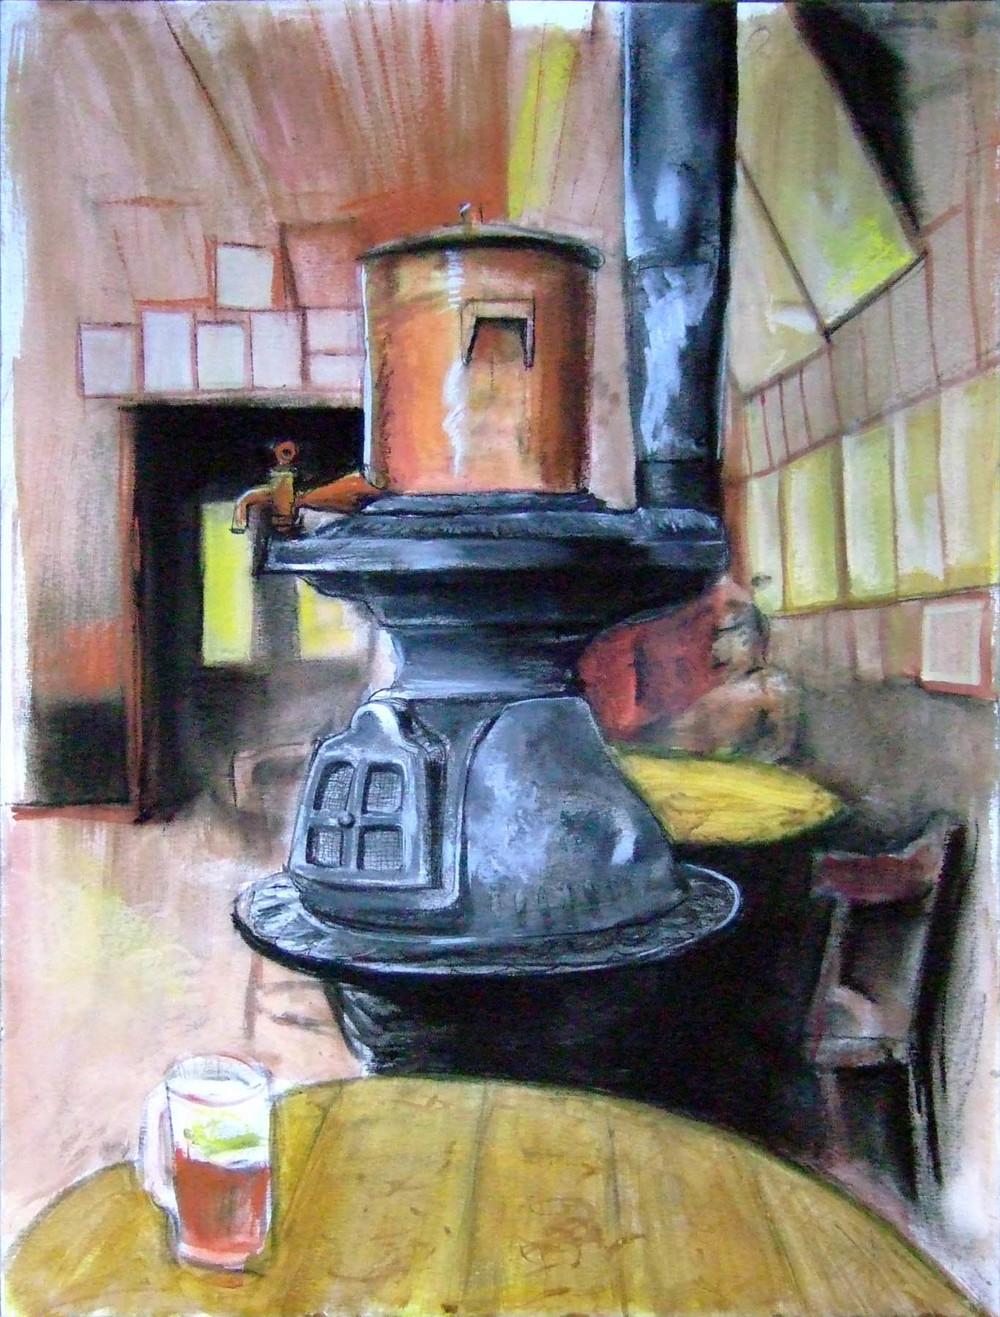 McSorley's stove